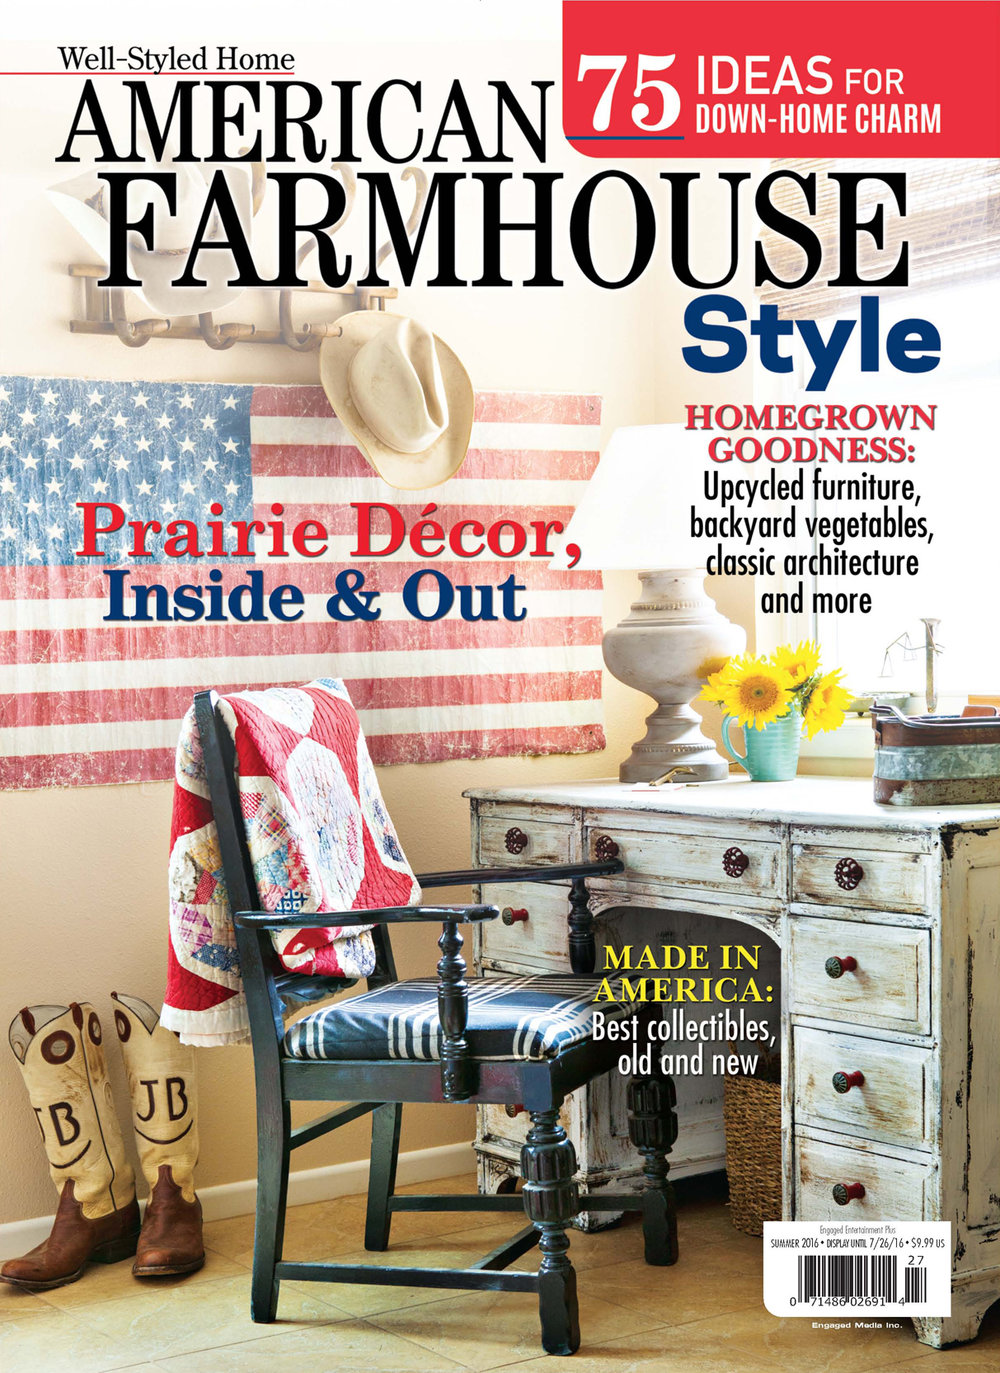 American Farmhouse Style Magazine Cover 2016.jpg